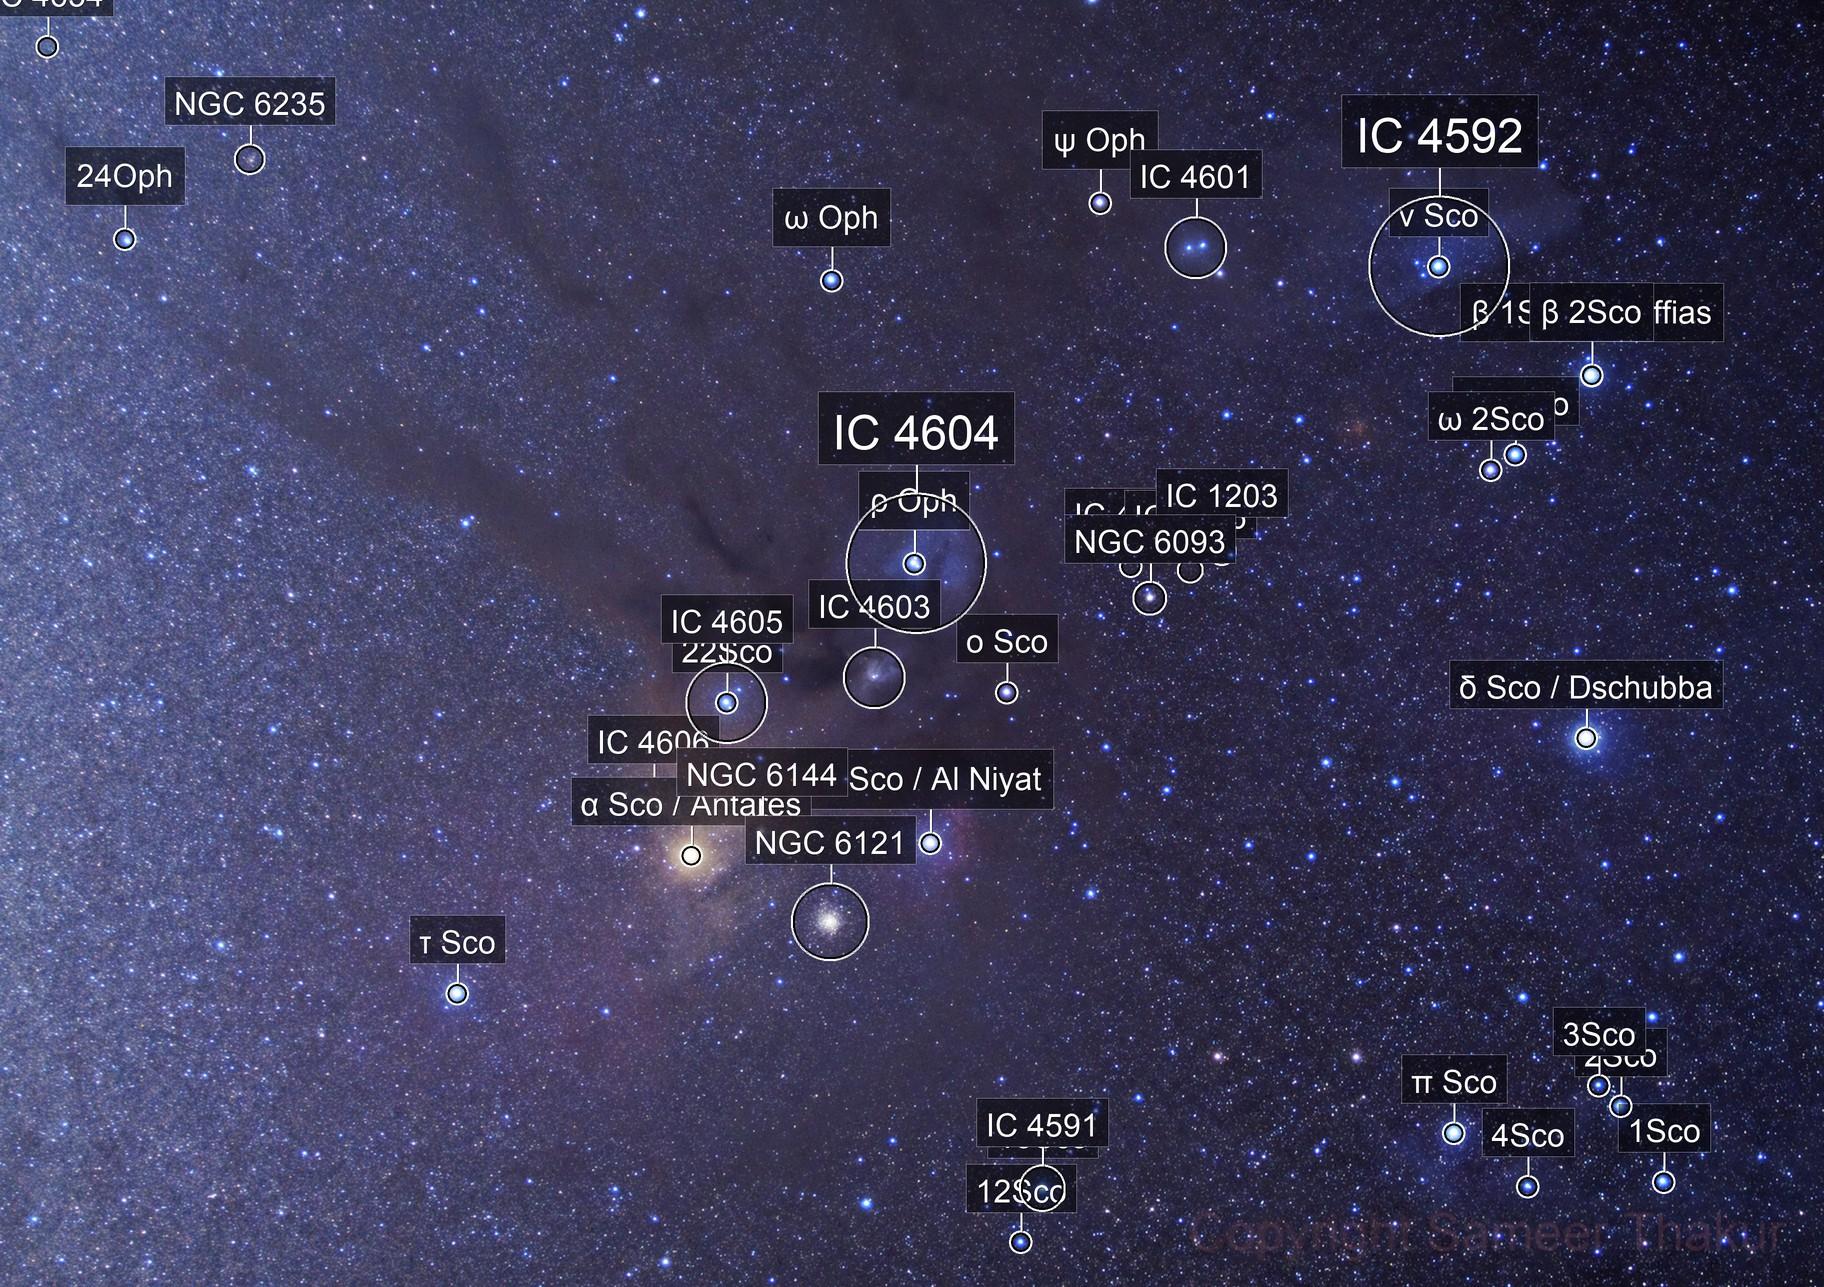 Antares & Rho Ophiuchus Region